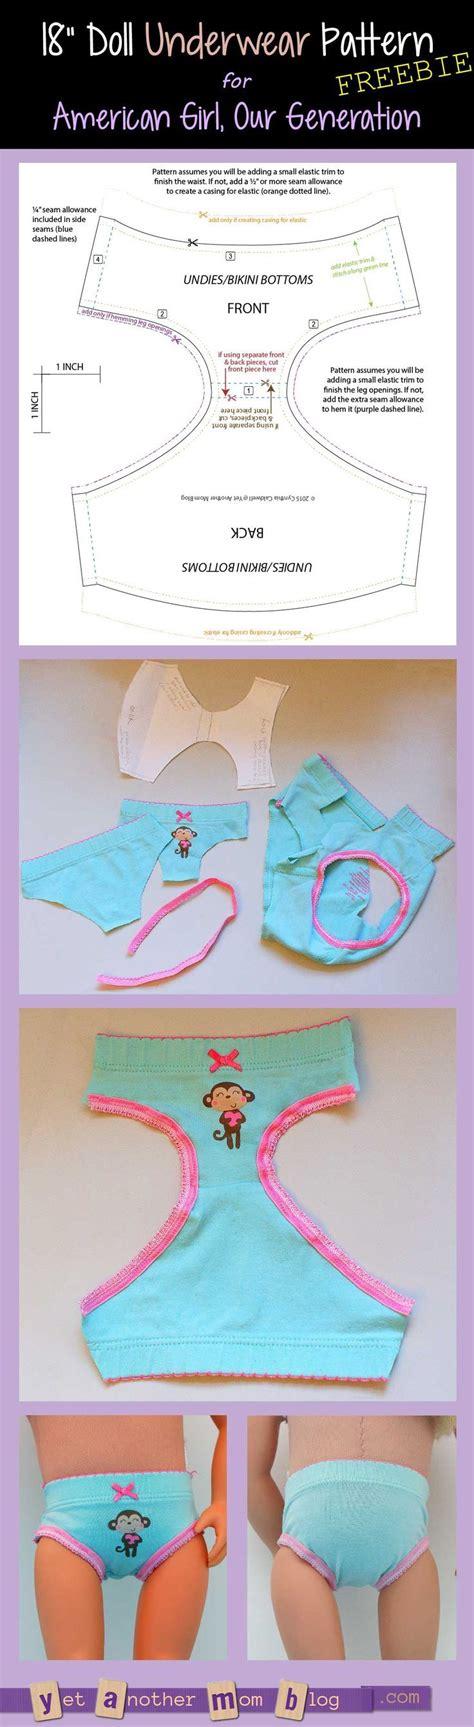 pattern generation using c our generation american girl undies bikini bottoms pattern